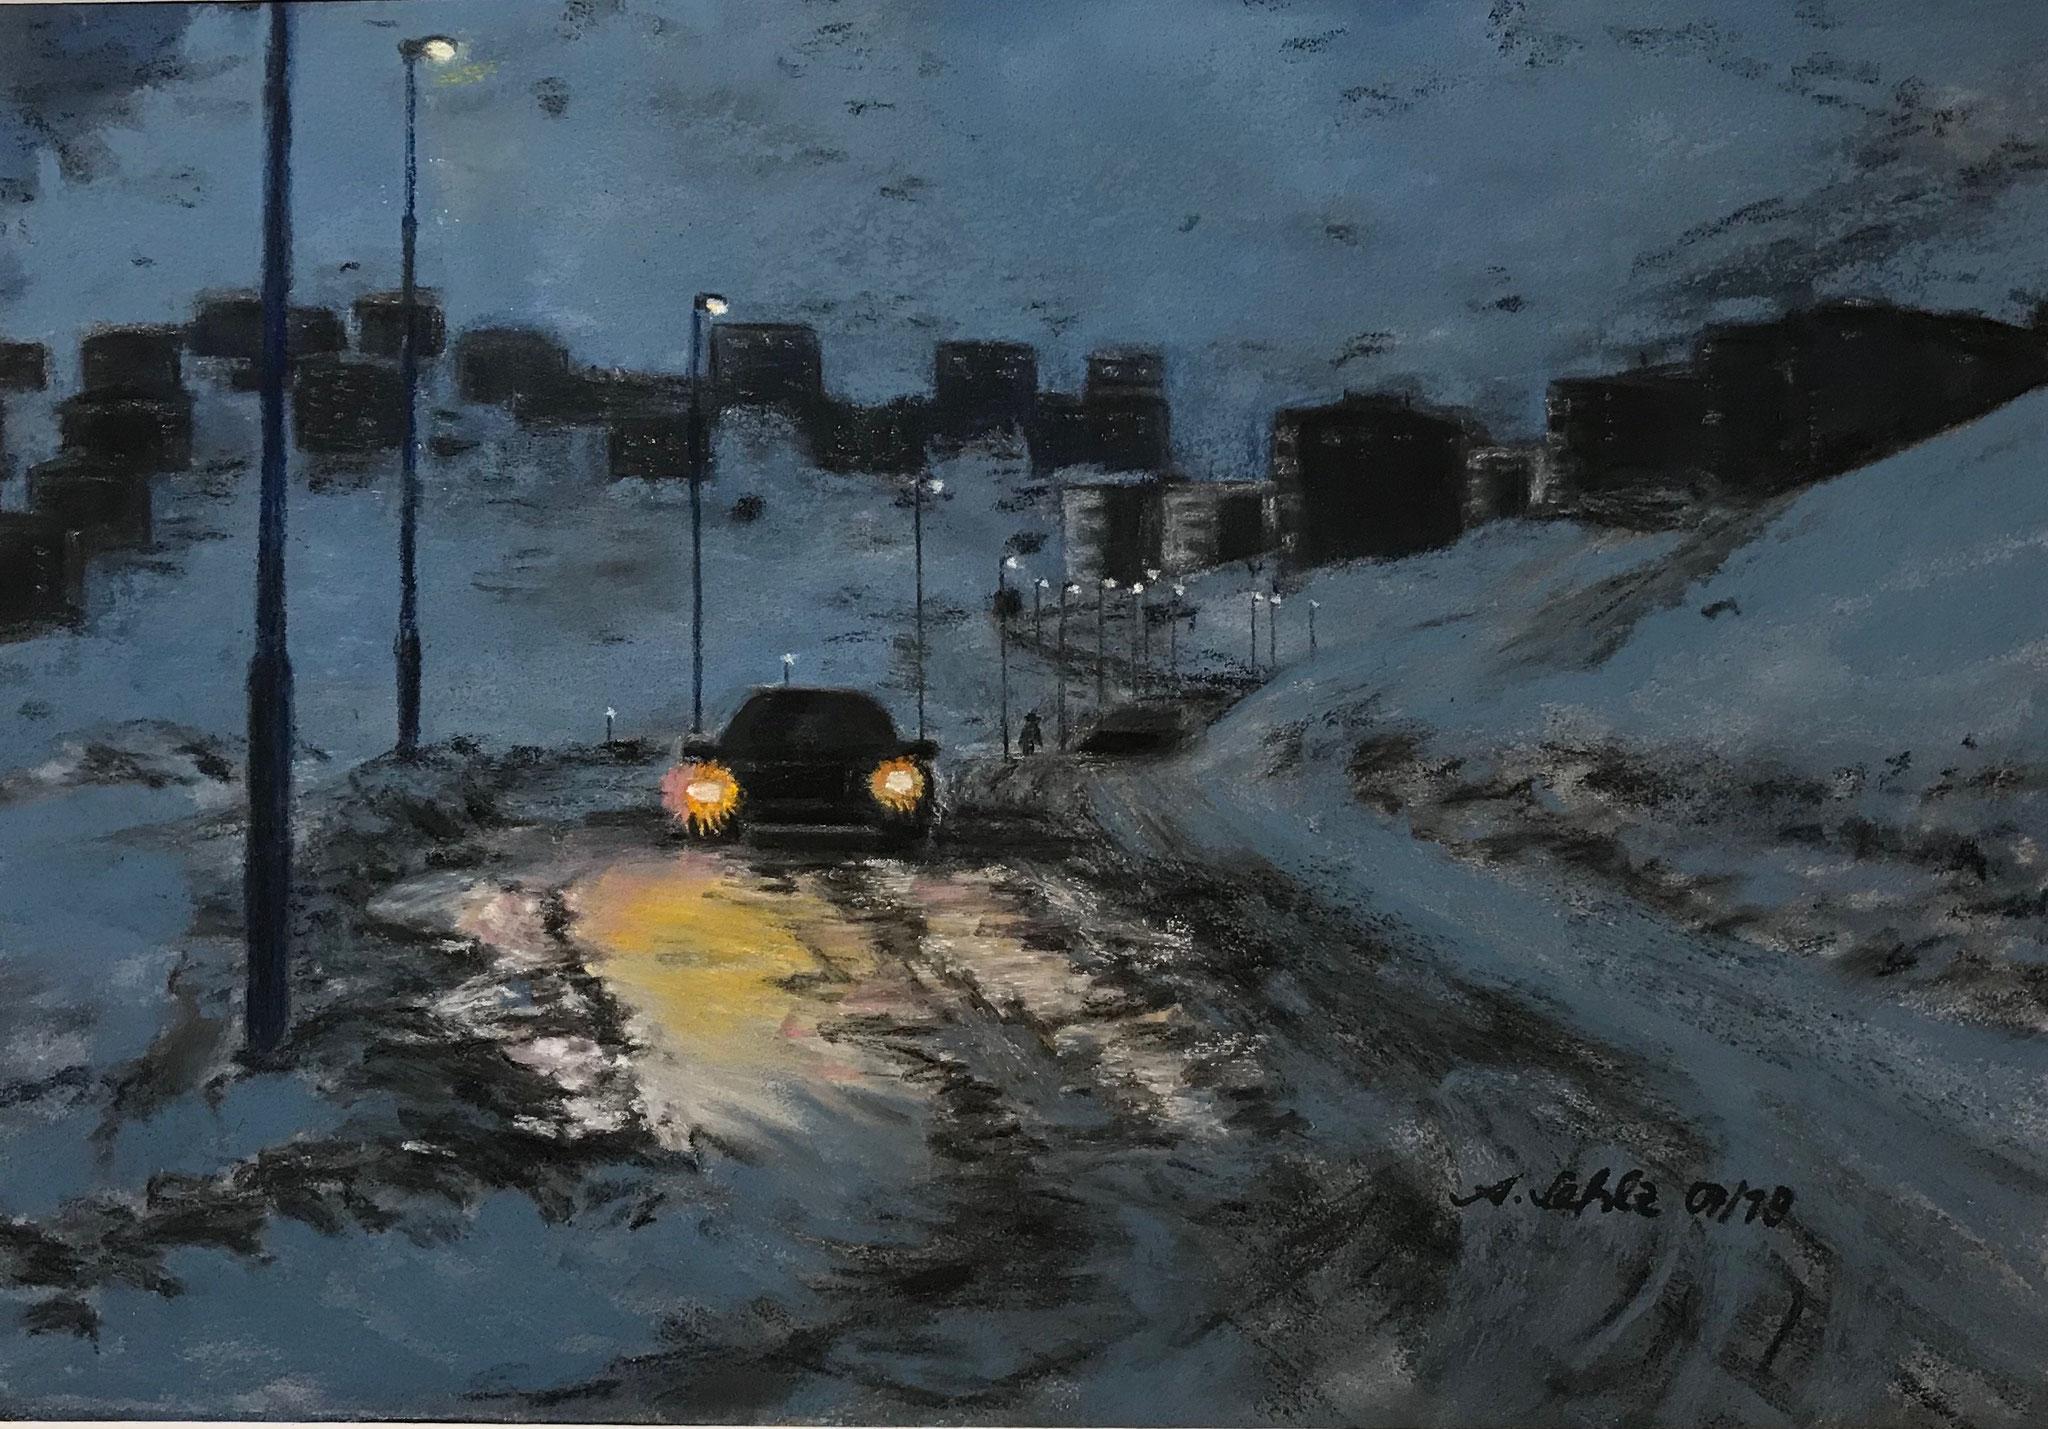 "16.12., Aquarell-, Acryl-, Pastell-""Malerei macht mich glücklich"", Annette Sehlz, Am Mellensee, A39"